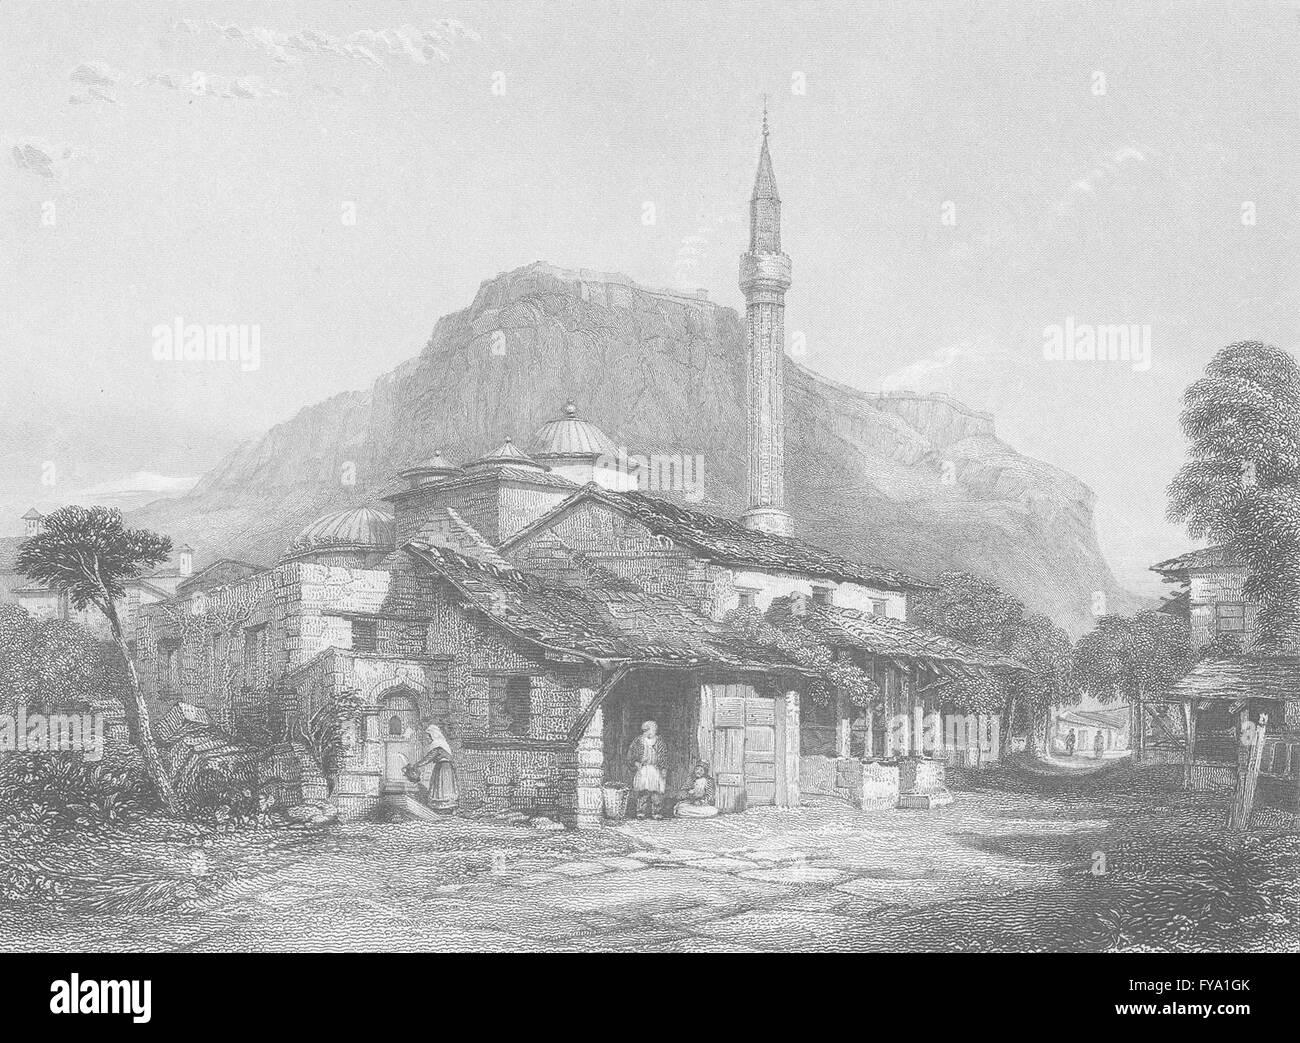 GREECE: Corinth ; Finden, antique print 1834 - Stock Image